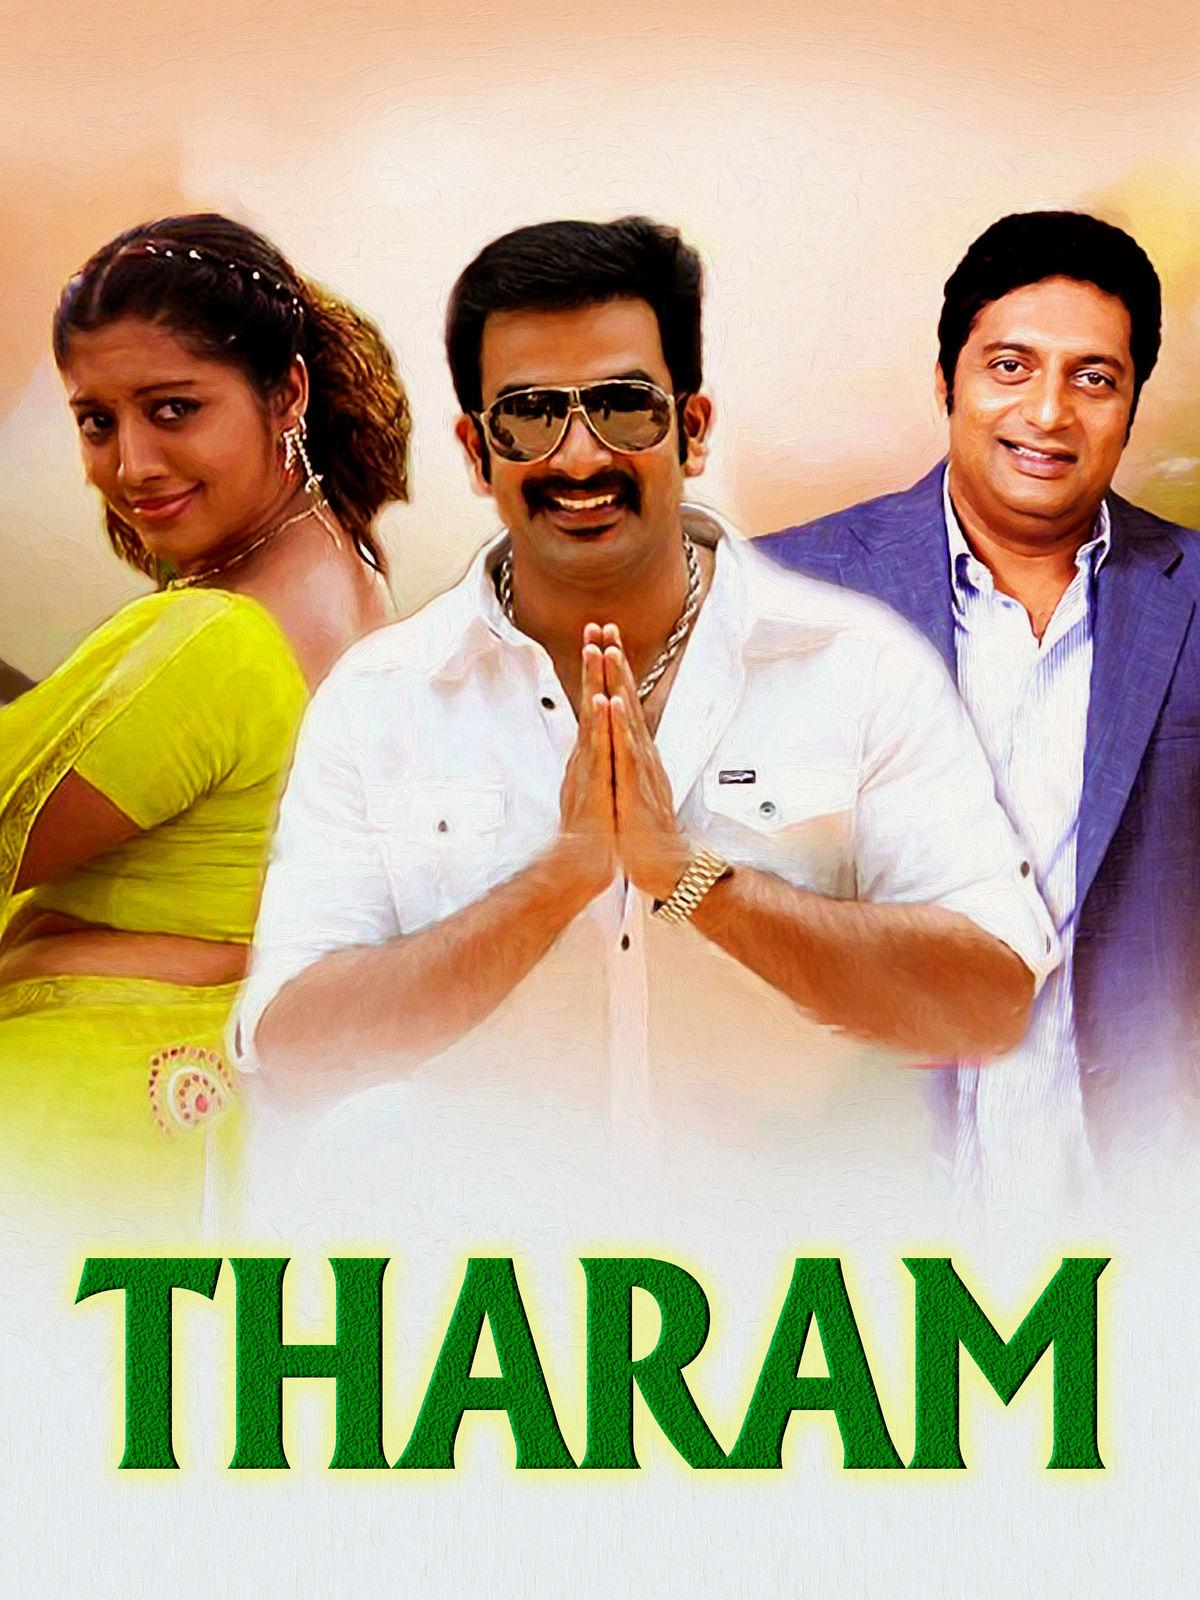 Prathap K Pothan Best Movies, TV Shows and Web Series List